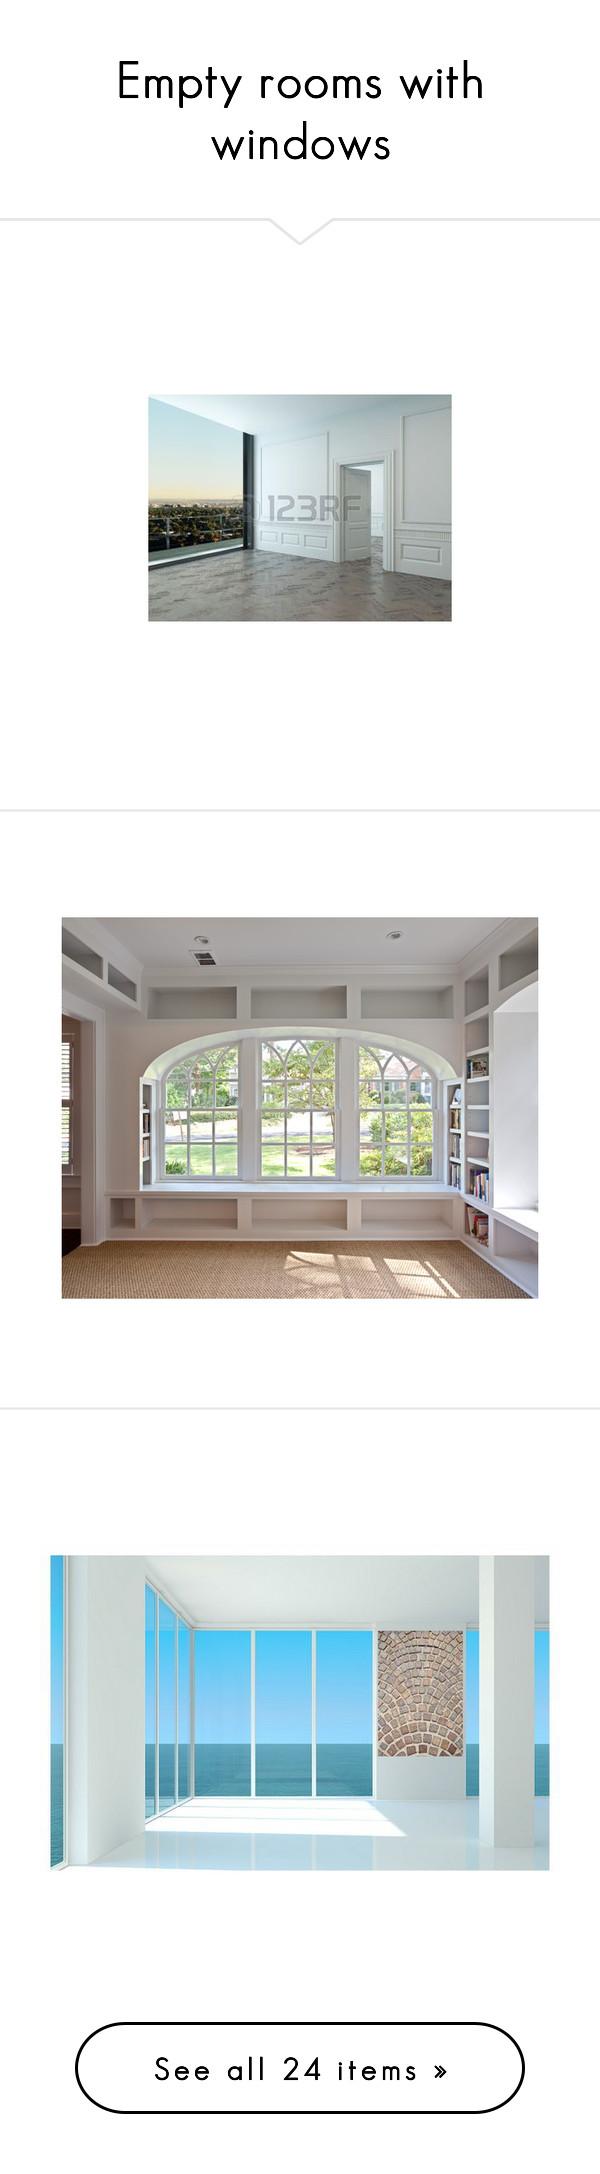 Home interior design windows empty rooms with windows